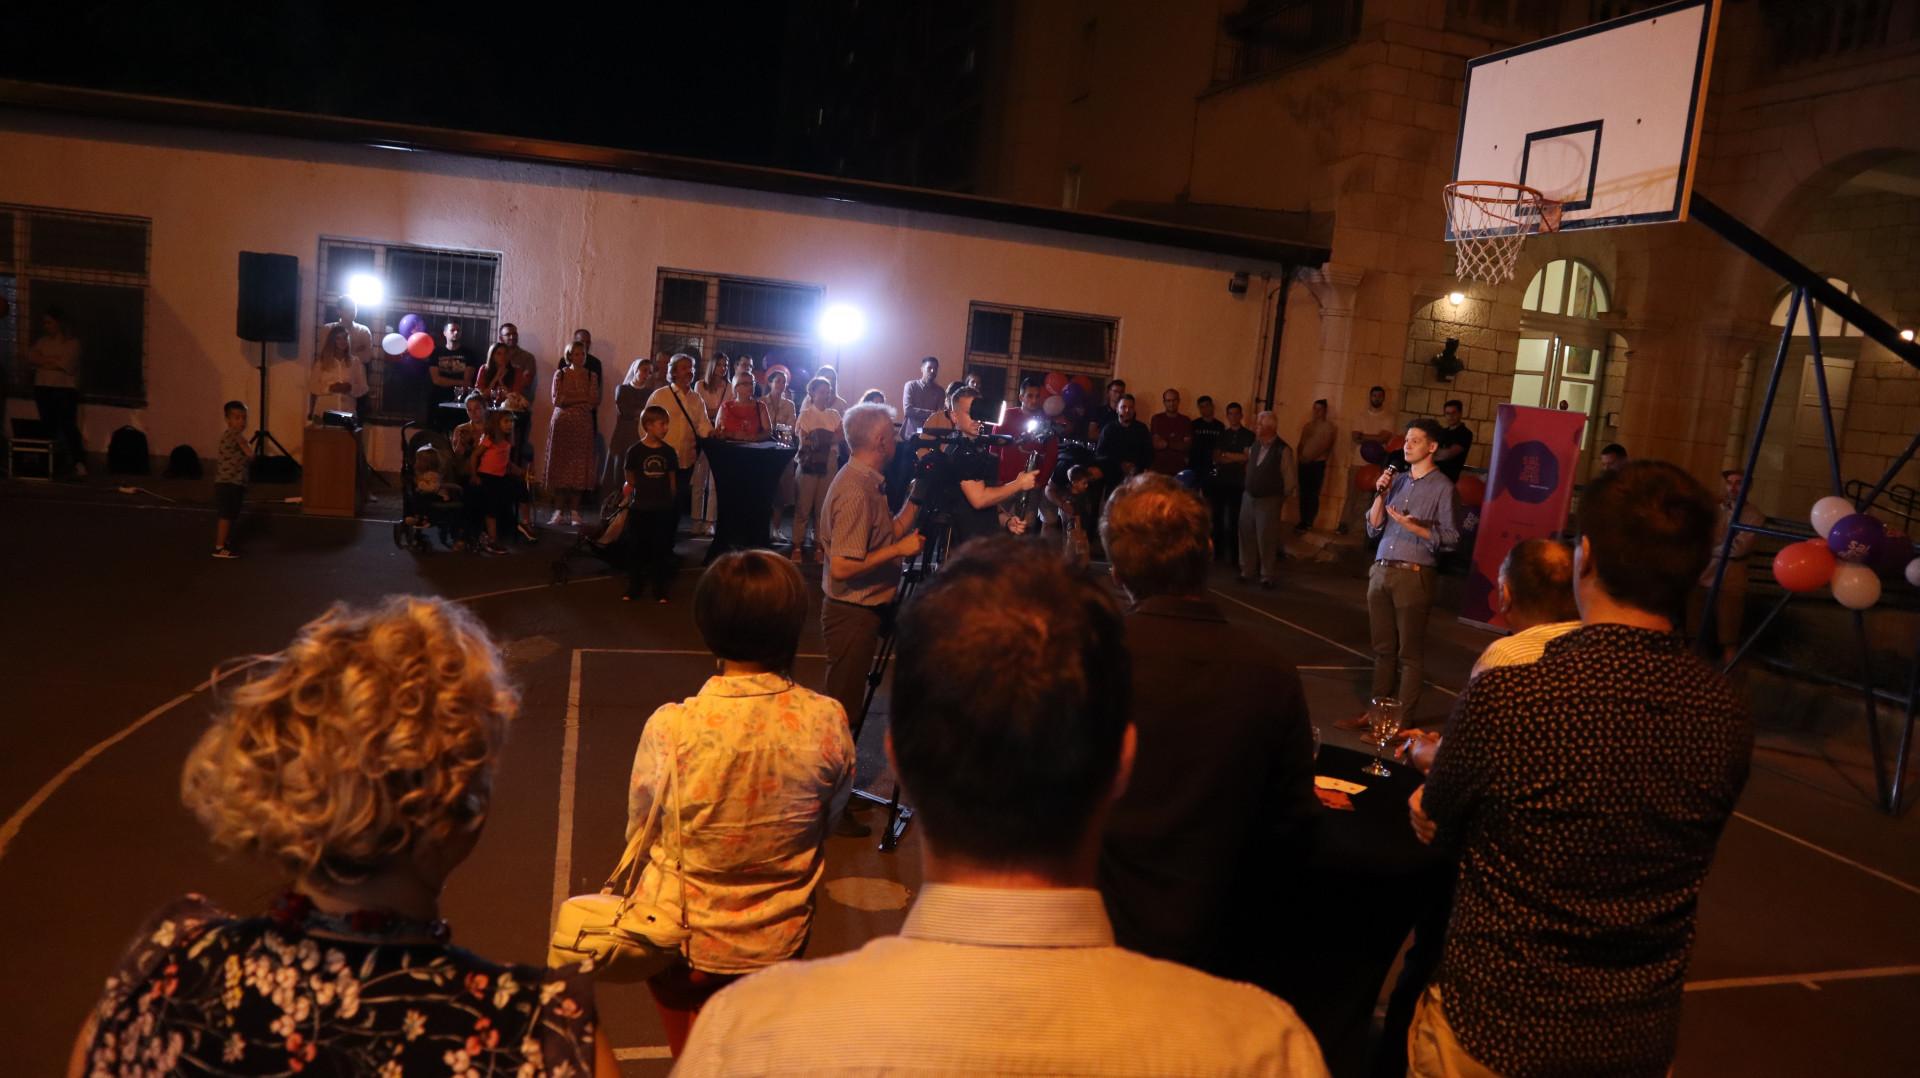 Nakladnička kuća Salesiana predstavila novi način i prostor rada